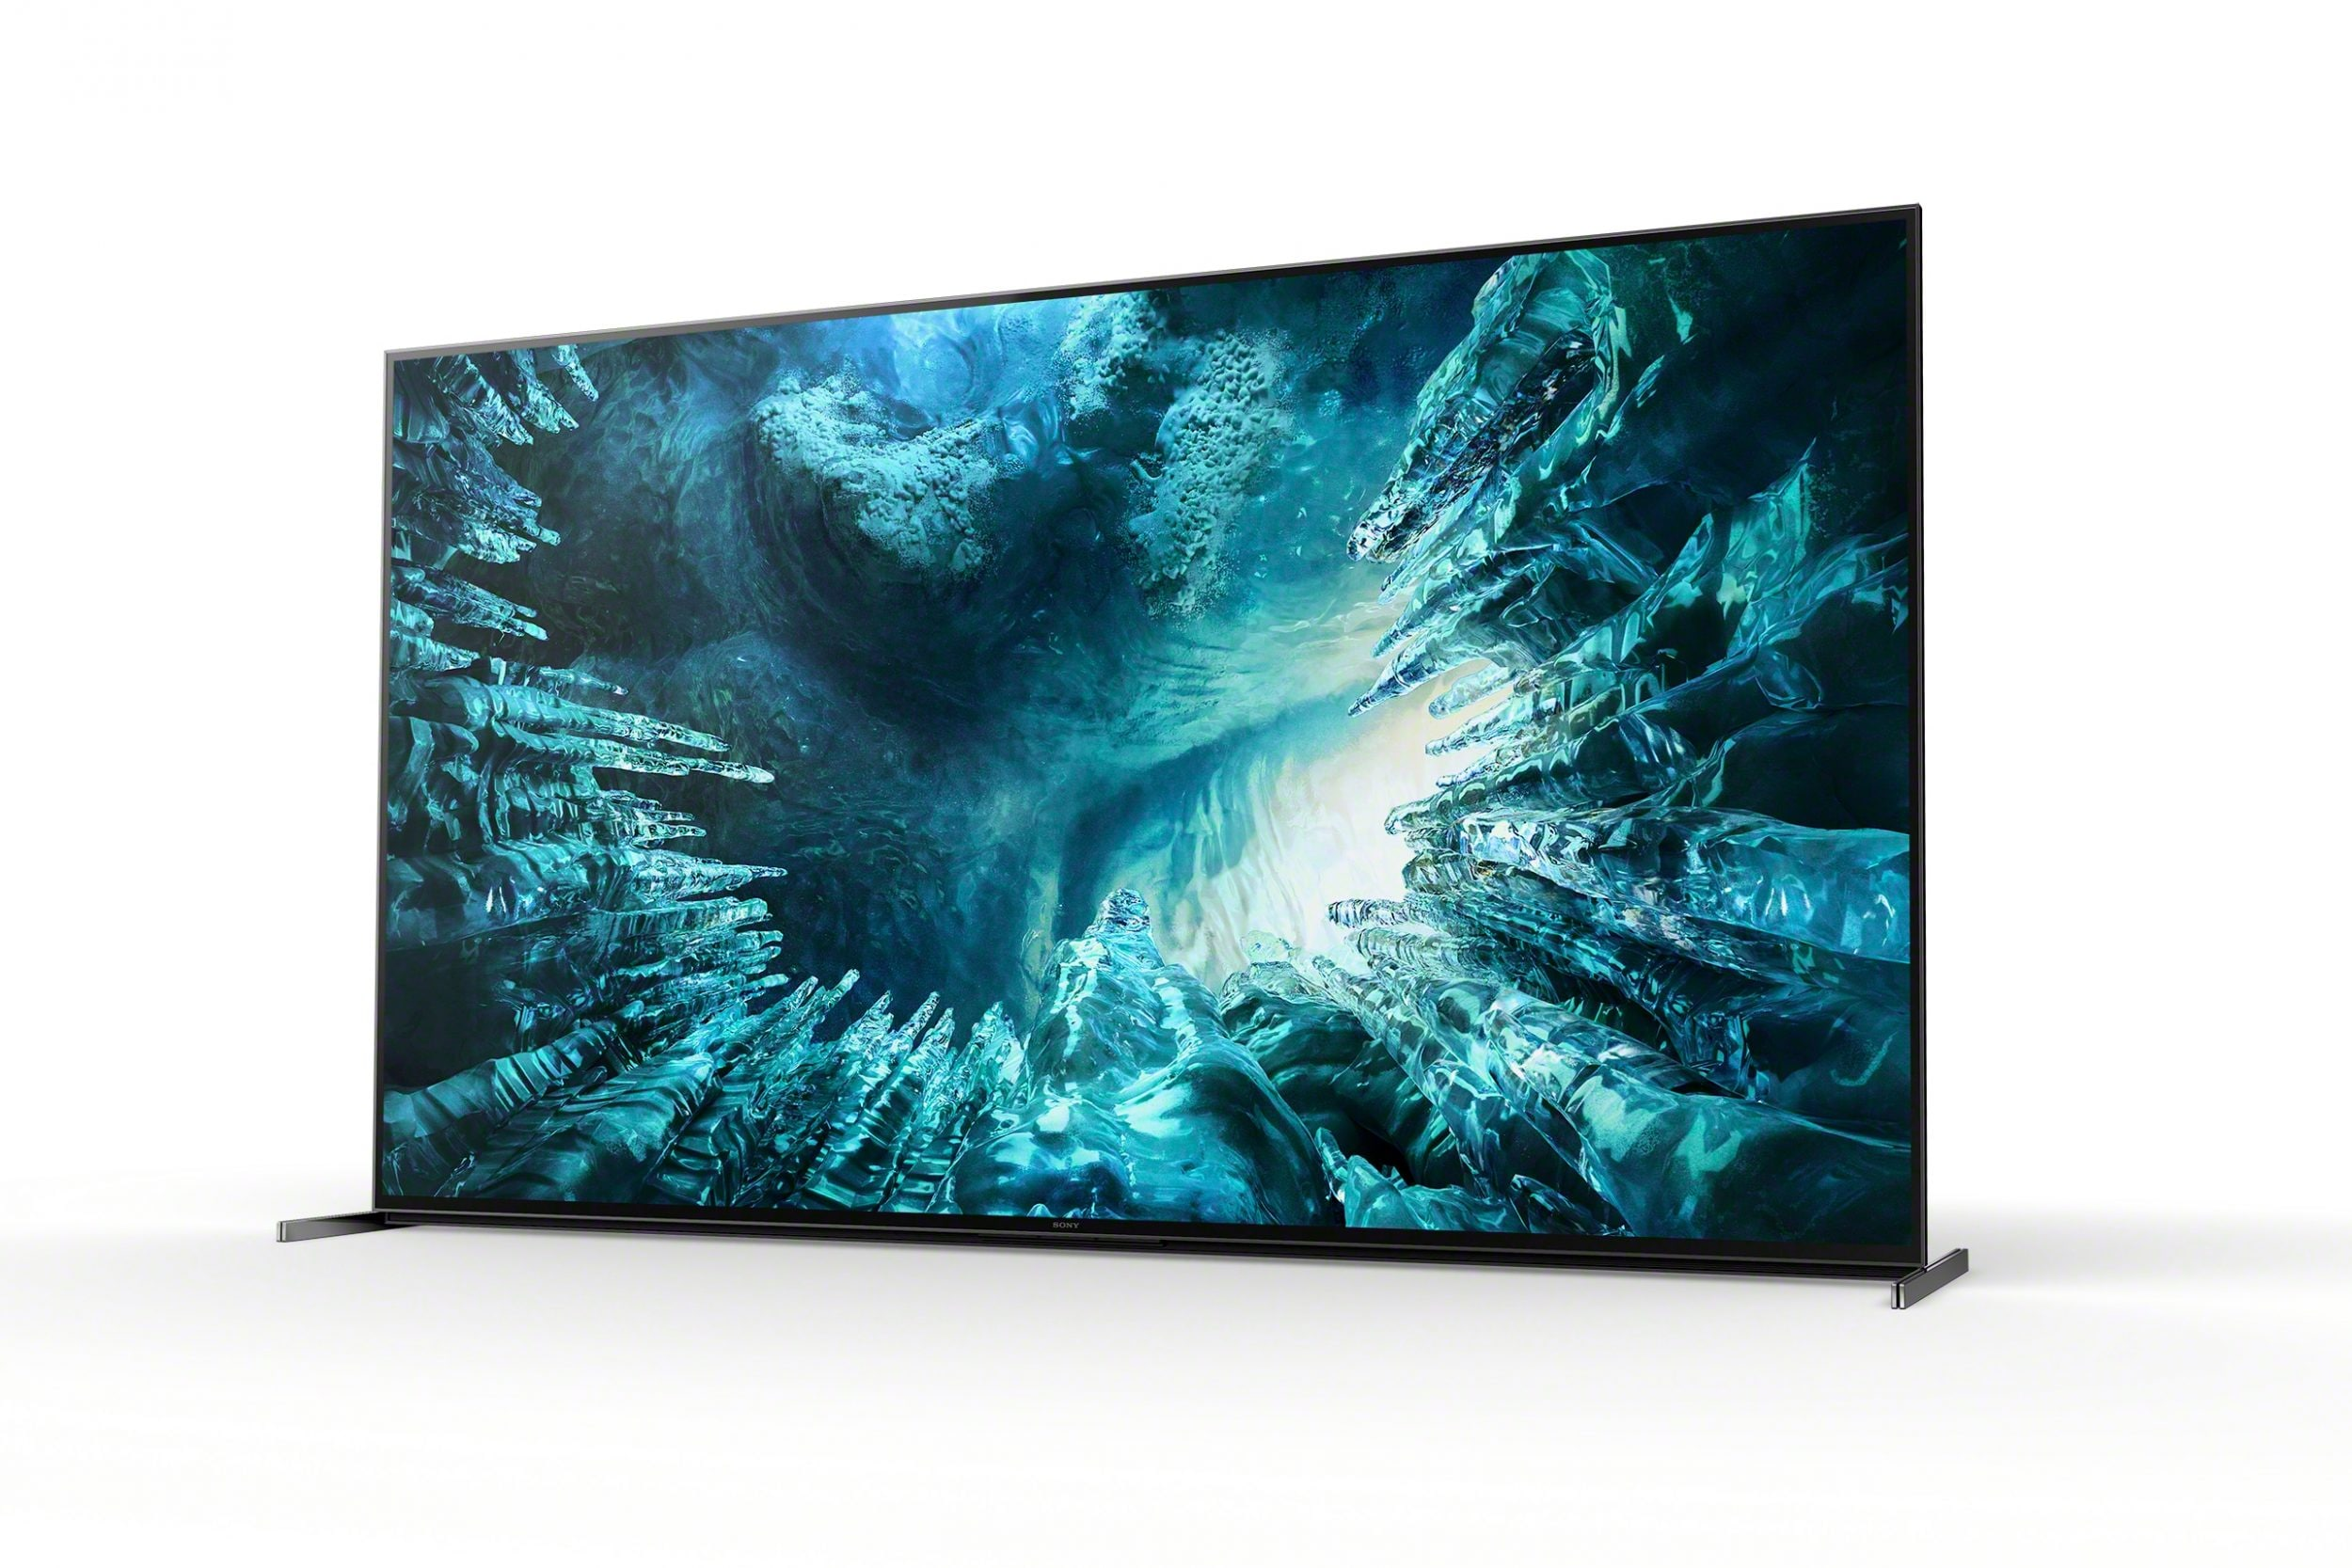 Sony svela nuovi televisori con Android TV per tutti i gusti: Full Array 8K e 4K, OLED 4K, dai 43 a